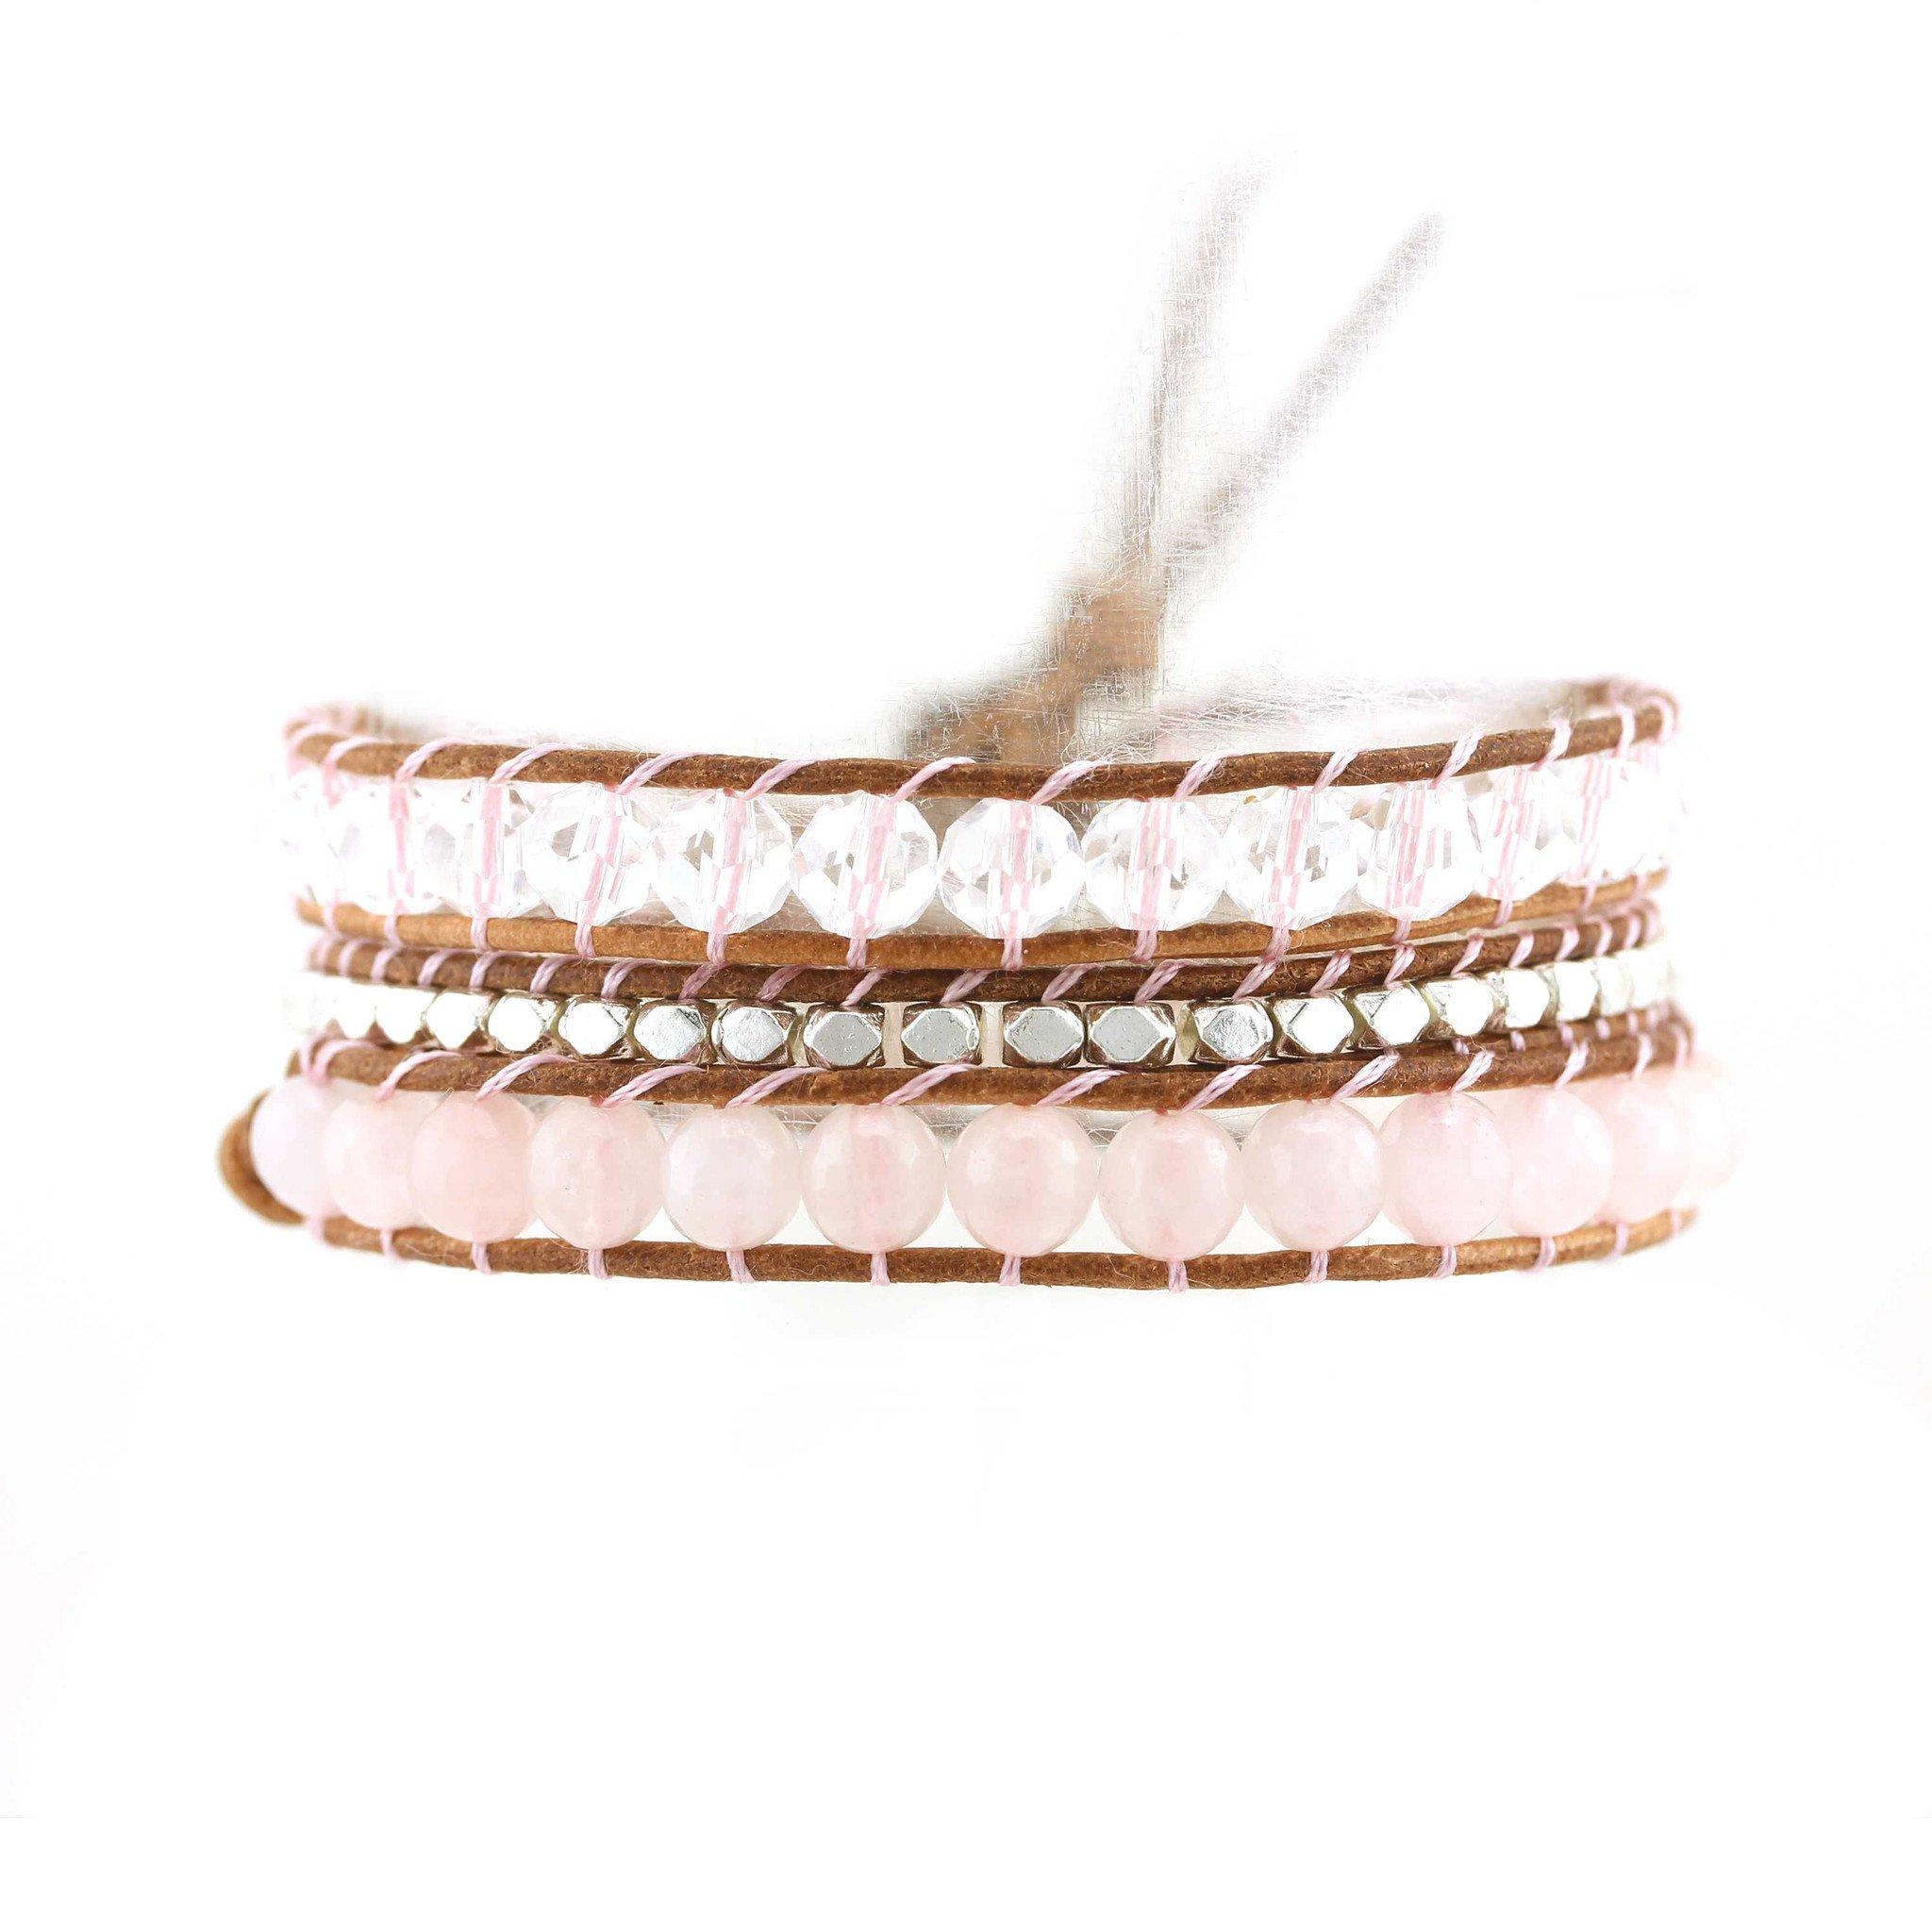 Balla Pink Jade Beaded Double Wrap Bracelet Choker Genuine Leather Bohemian Layered Style for Women Girls Teens by by Balla